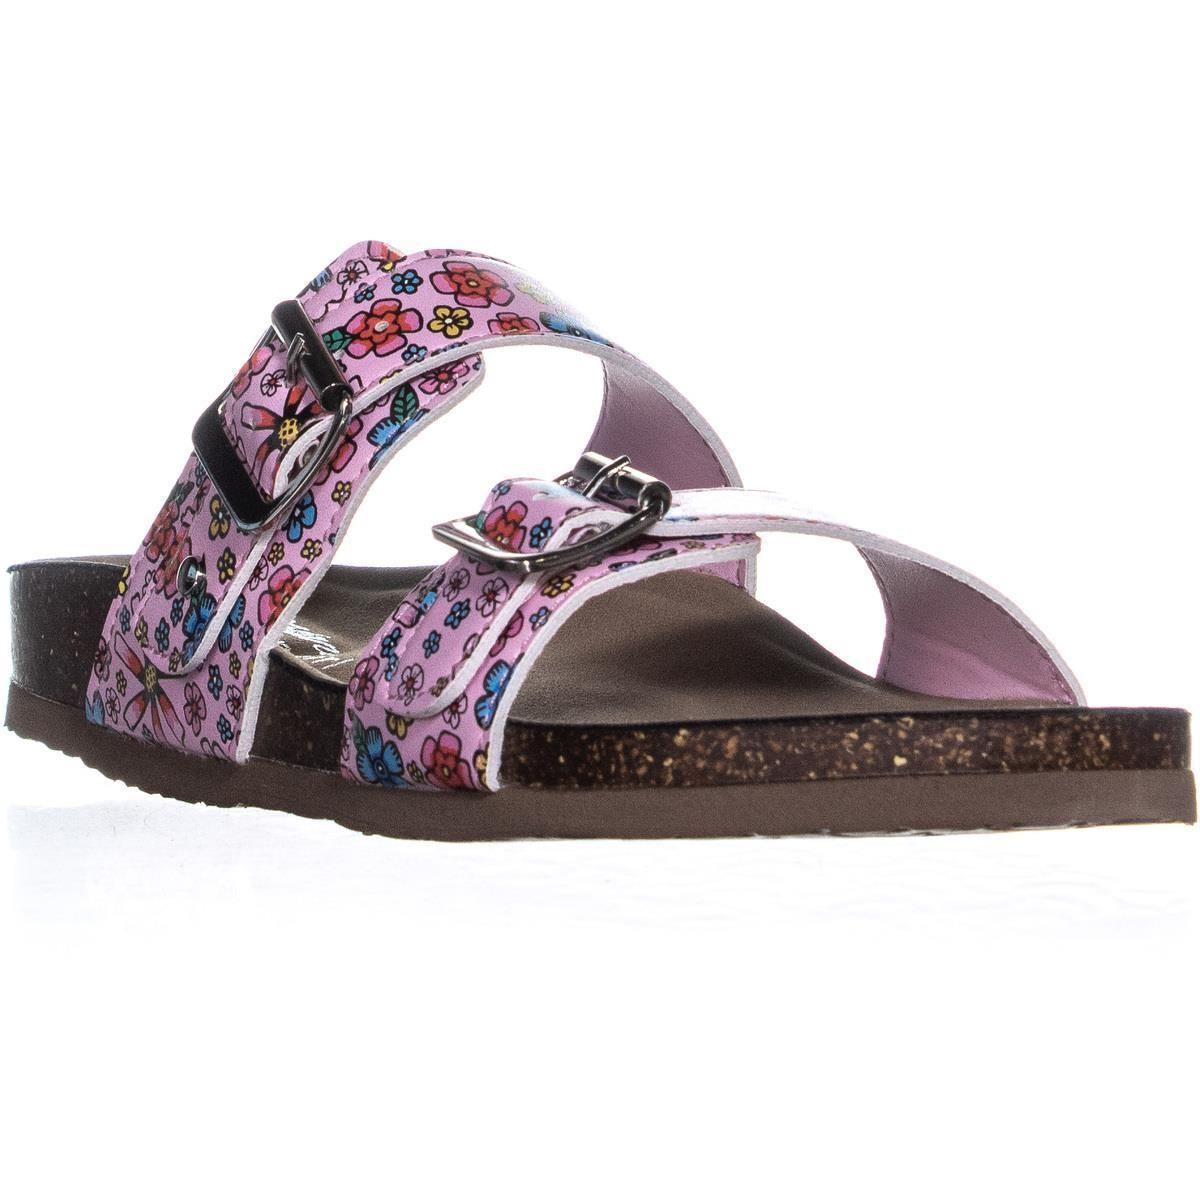 a9d7c1df015b Lyst - Madden Girl Brando-j Slide Sandal in Pink - Save 47%